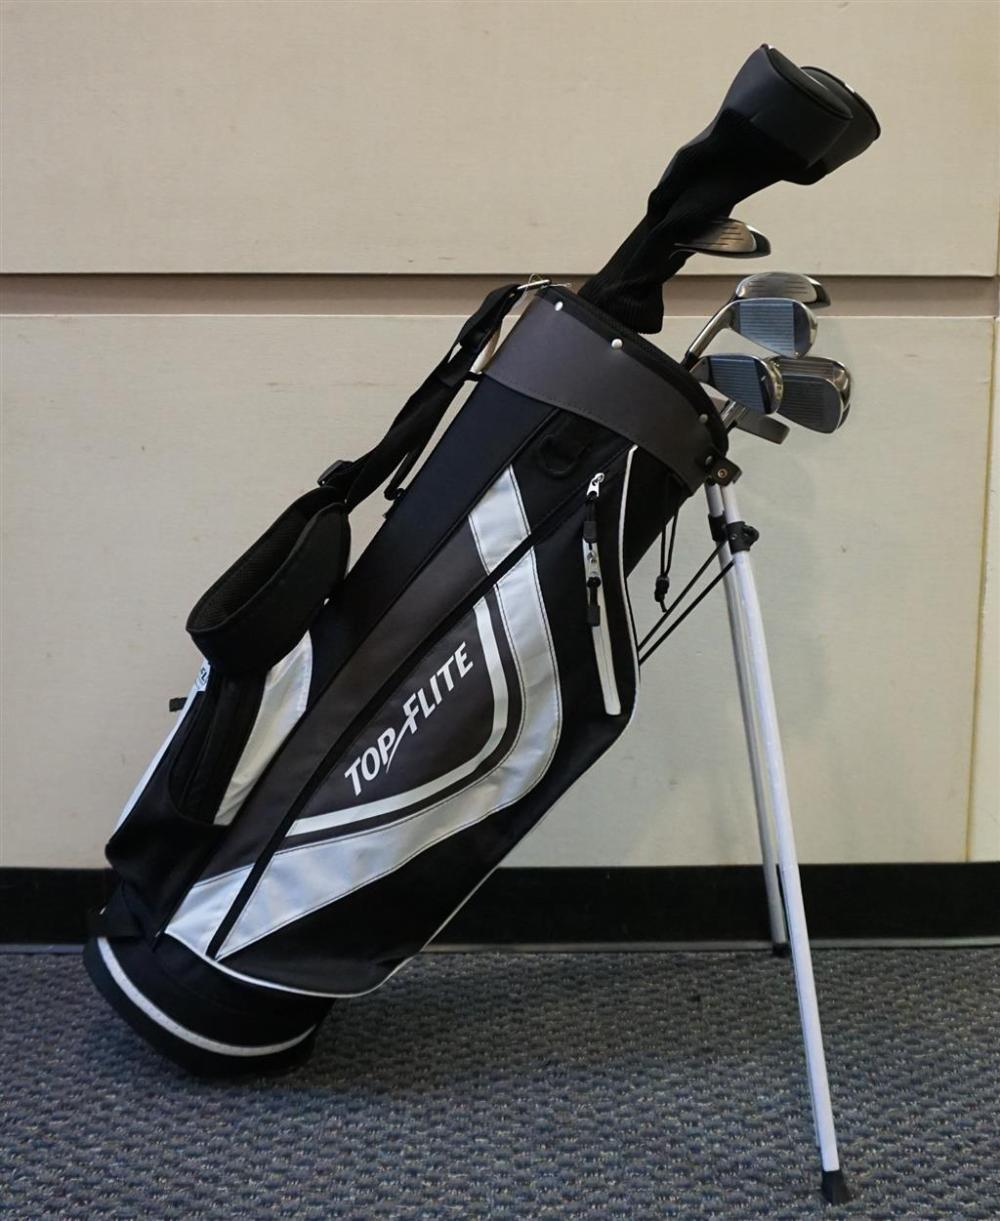 Top Elite Freestanding Black and White Nylon Golf Bag with Ten Right-Handed Senior Flex Clubs